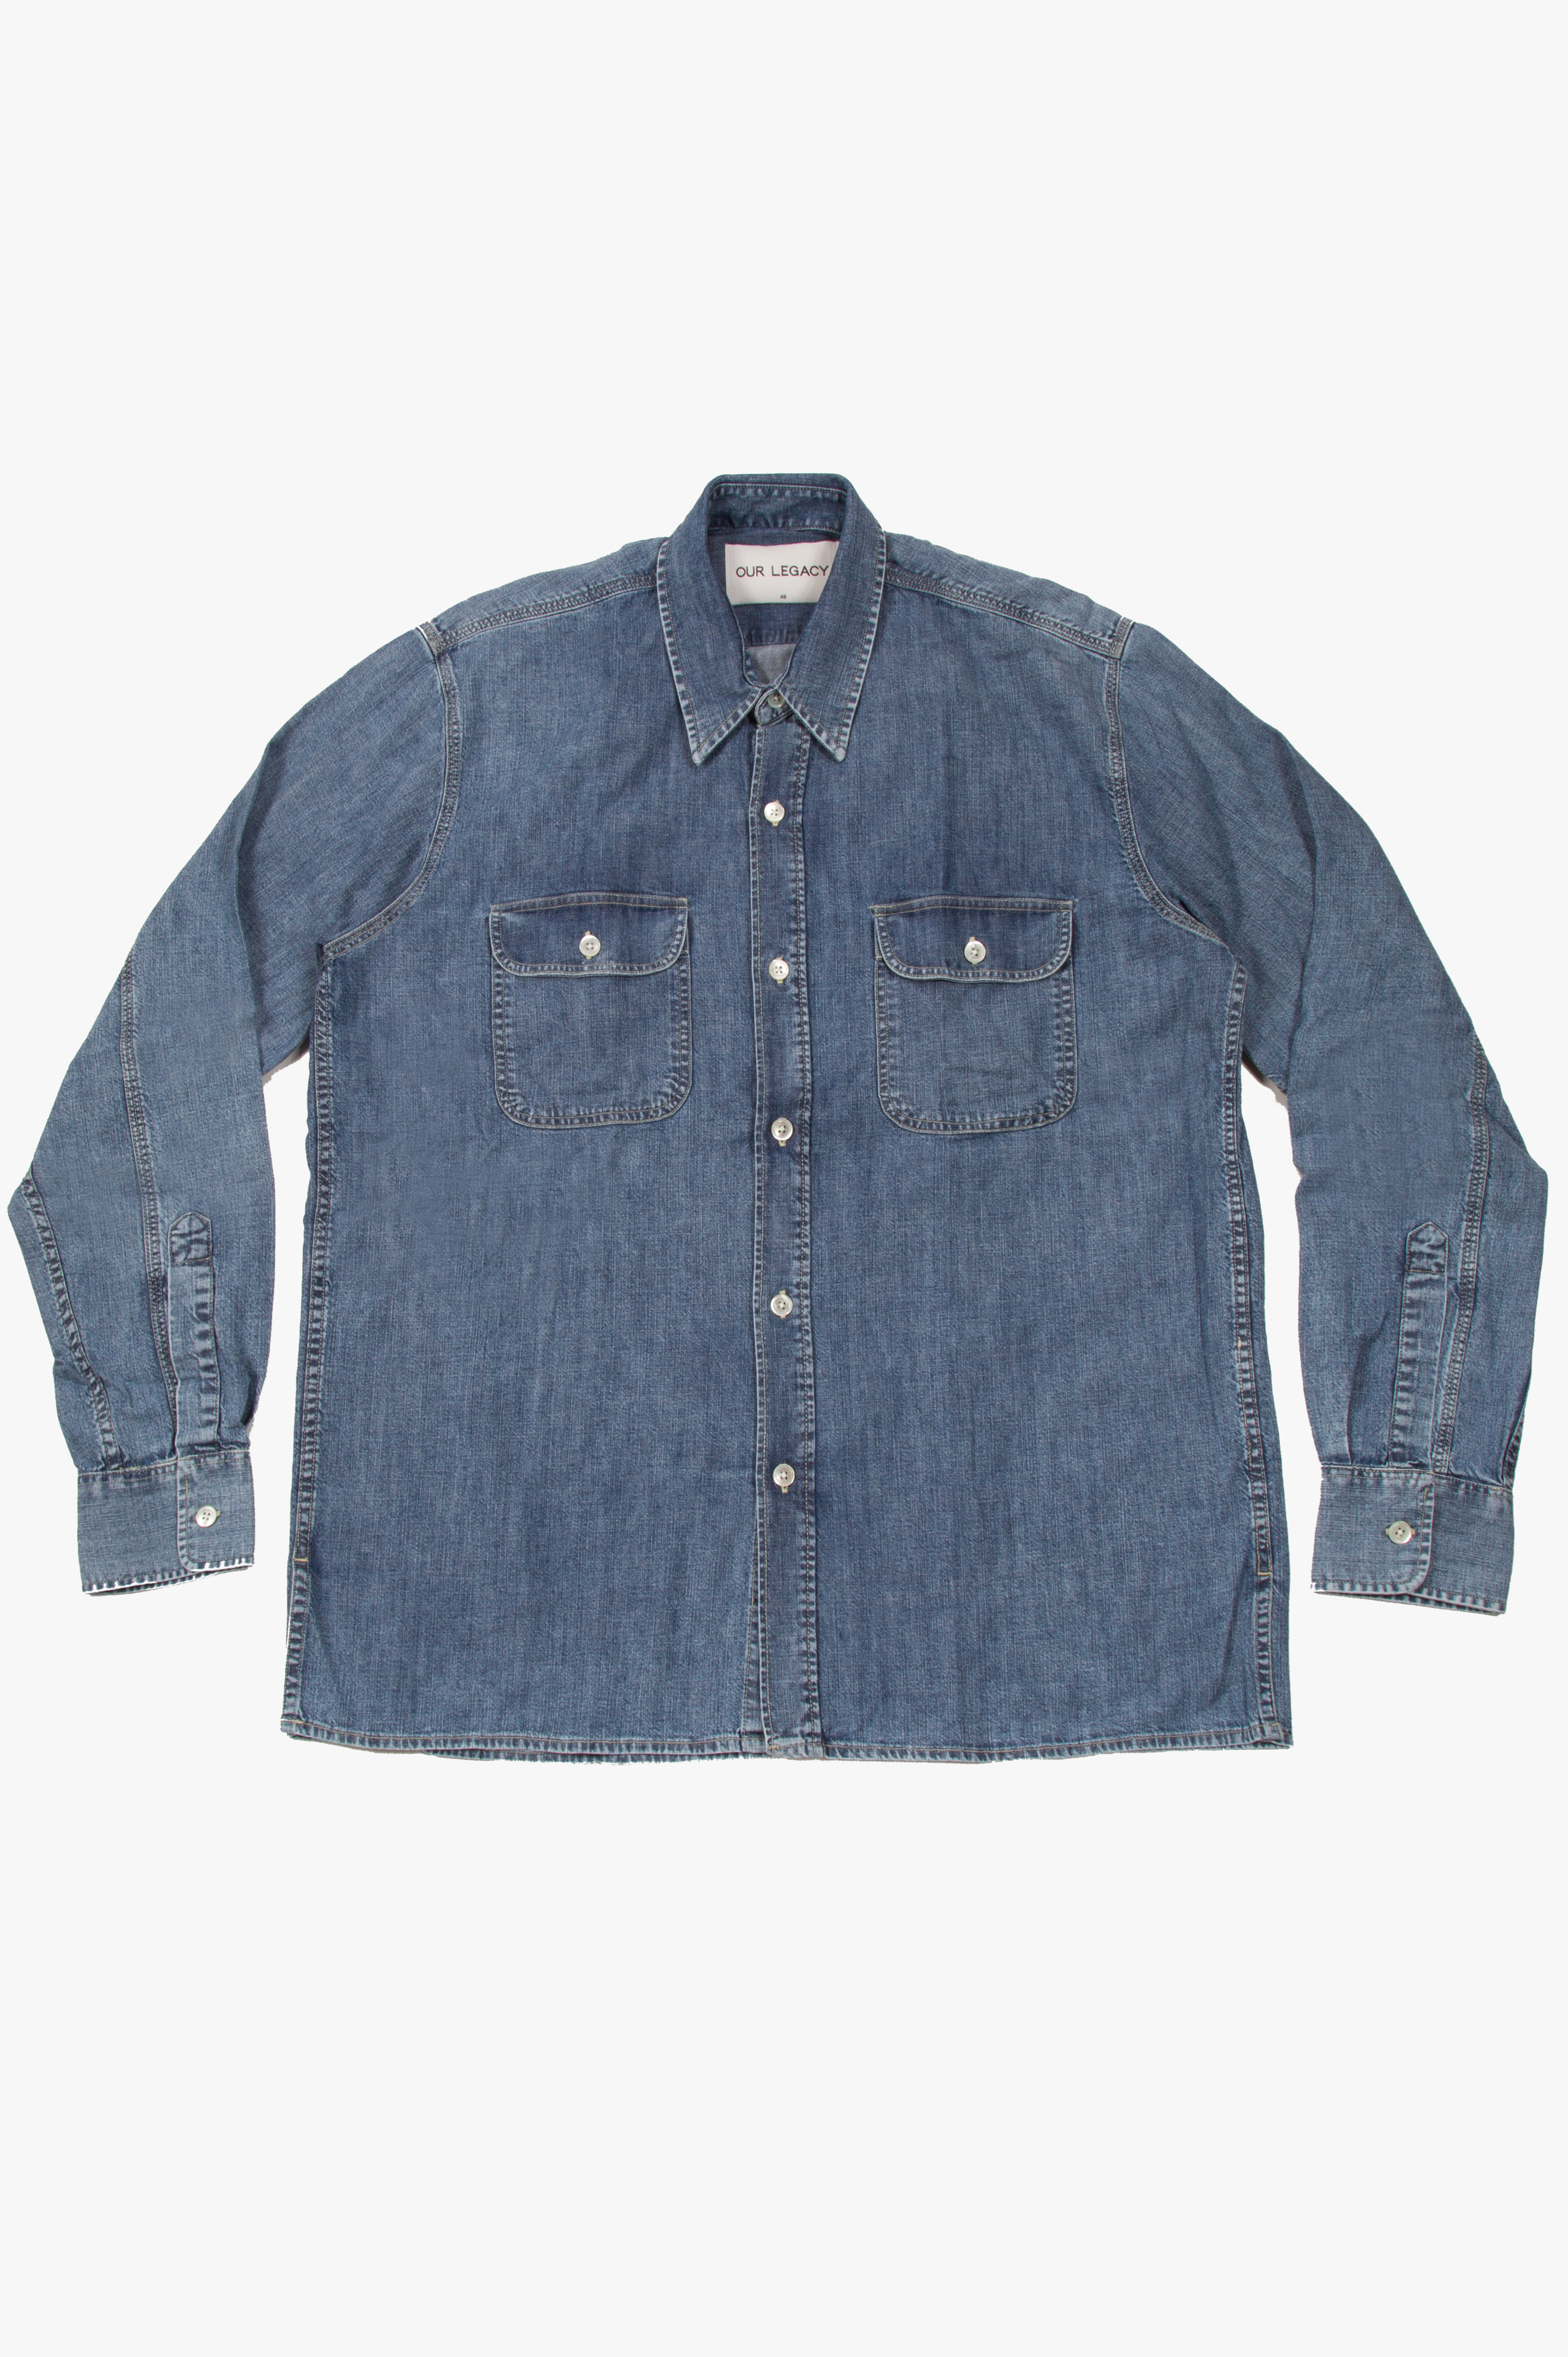 Country Shirt Vintage Blue Denim